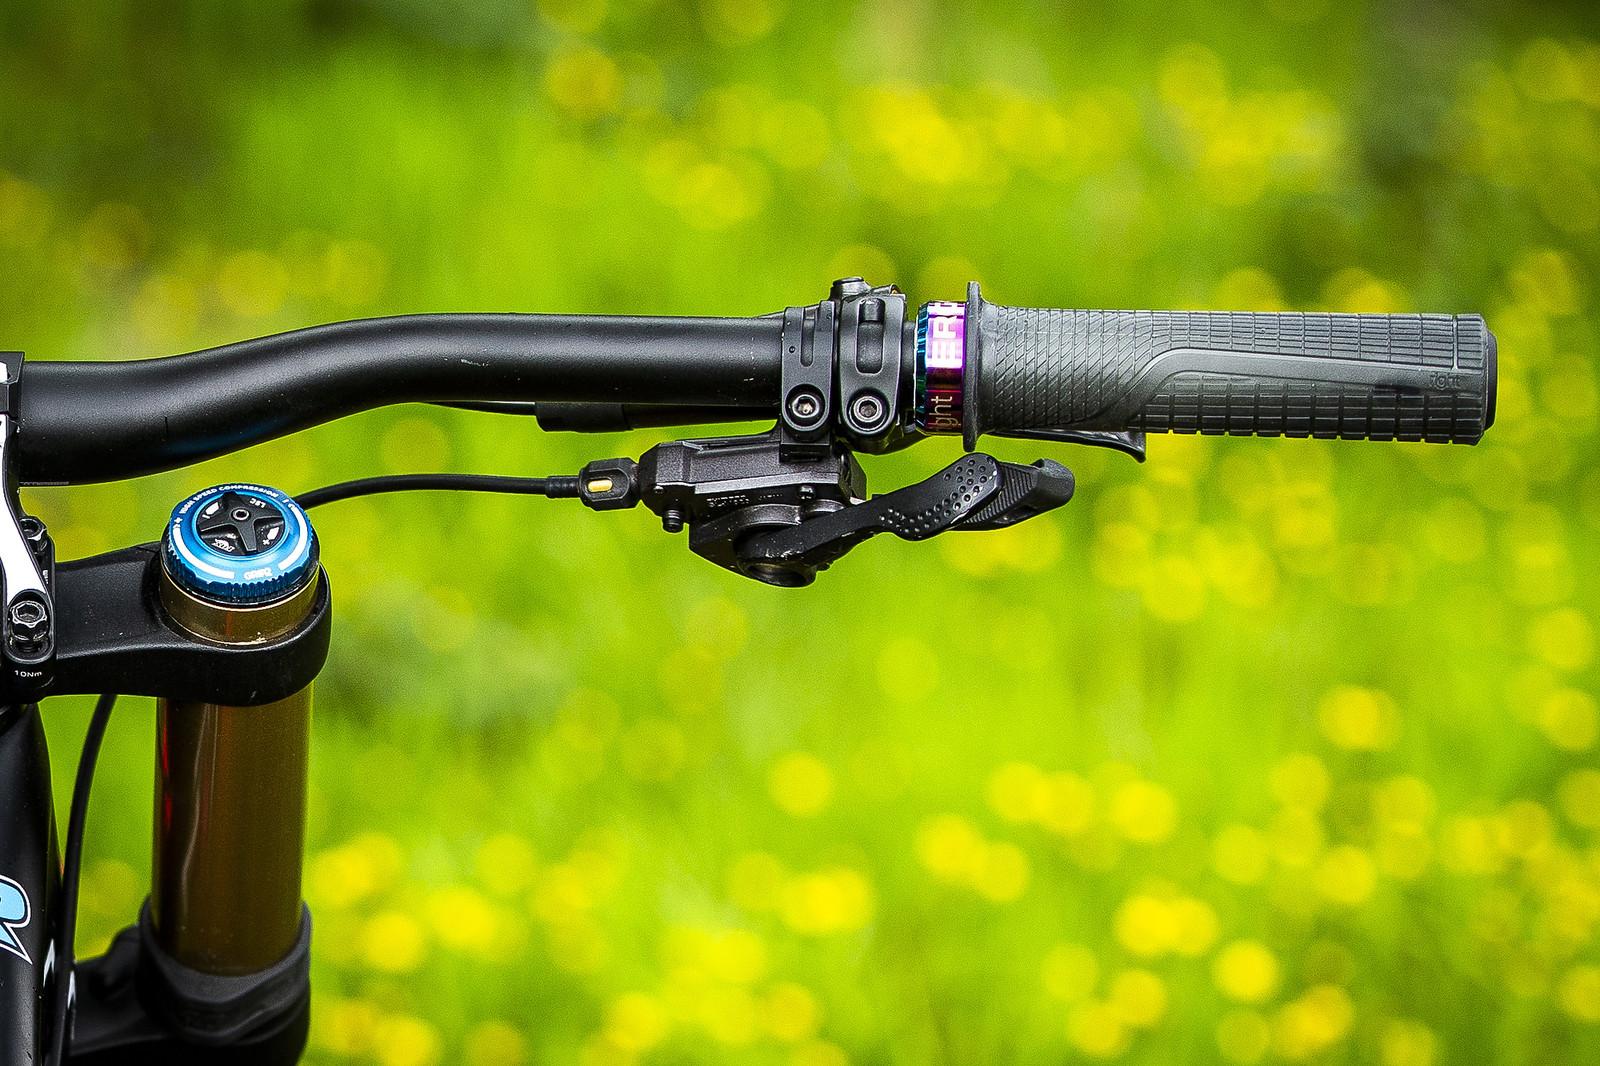 Ergon Grips - WINNING BIKE - Tahnee Seagrave's Transition TR11 - Mountain Biking Pictures - Vital MTB